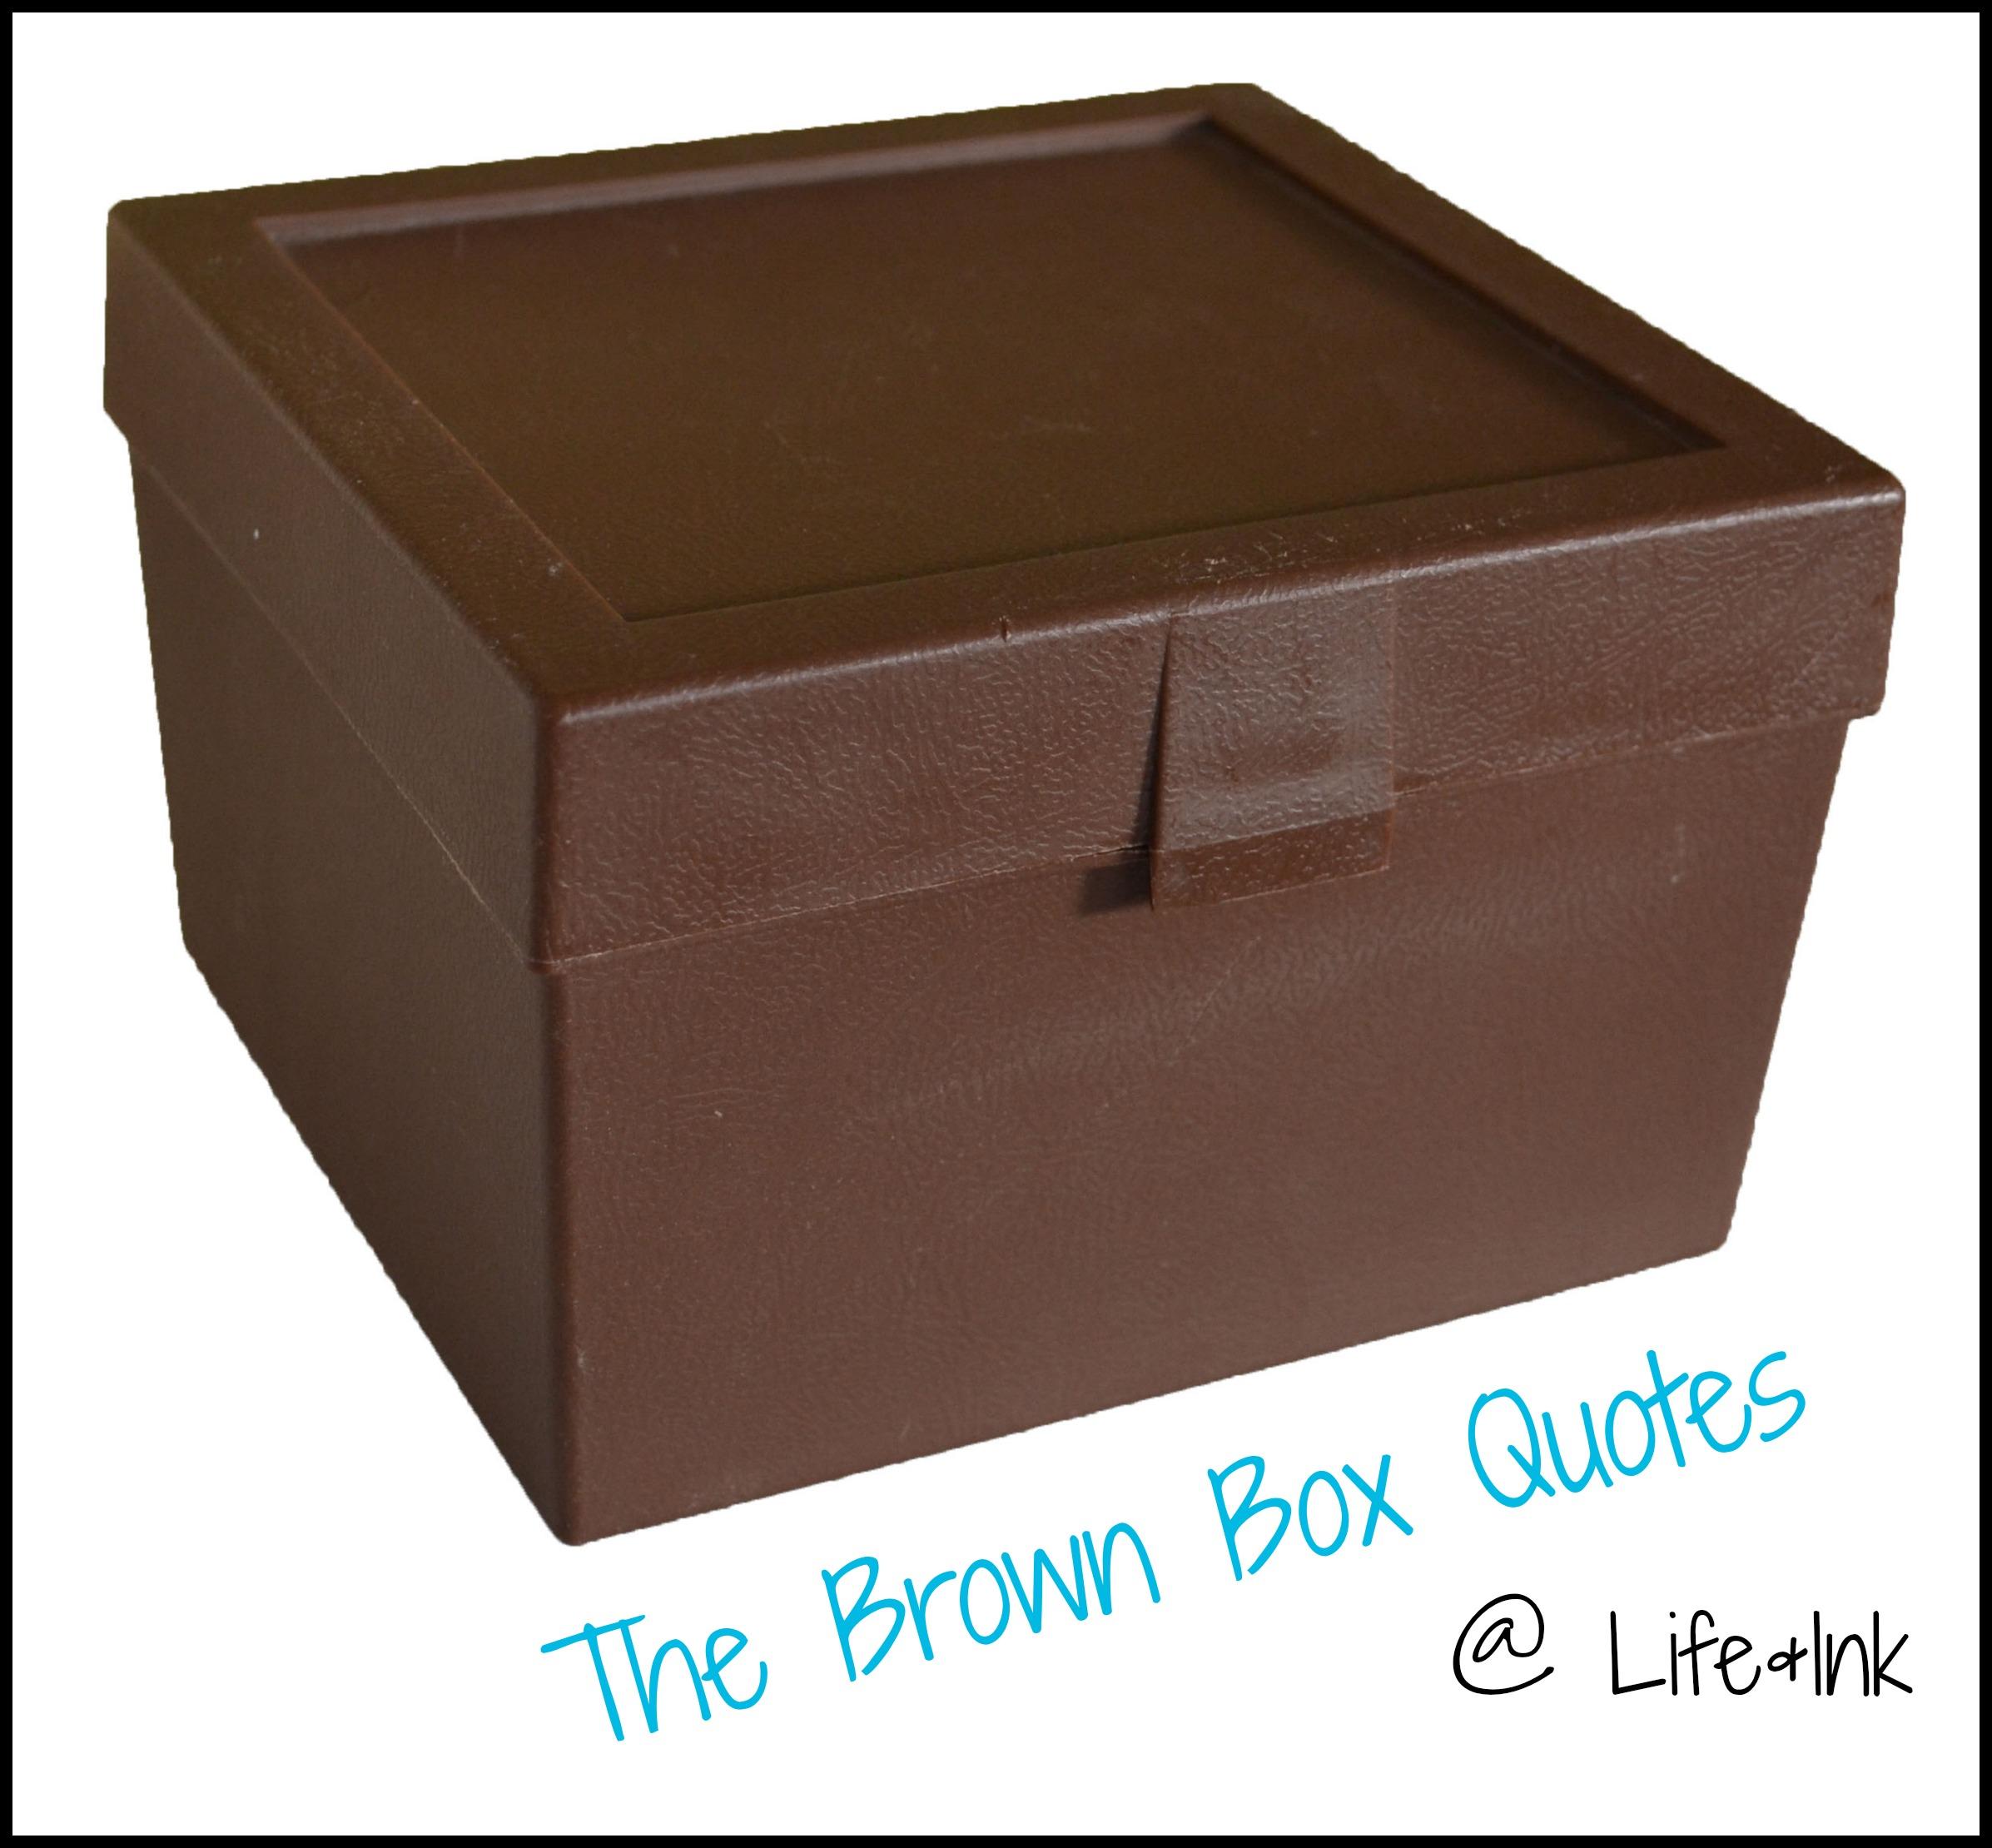 Box quote #3